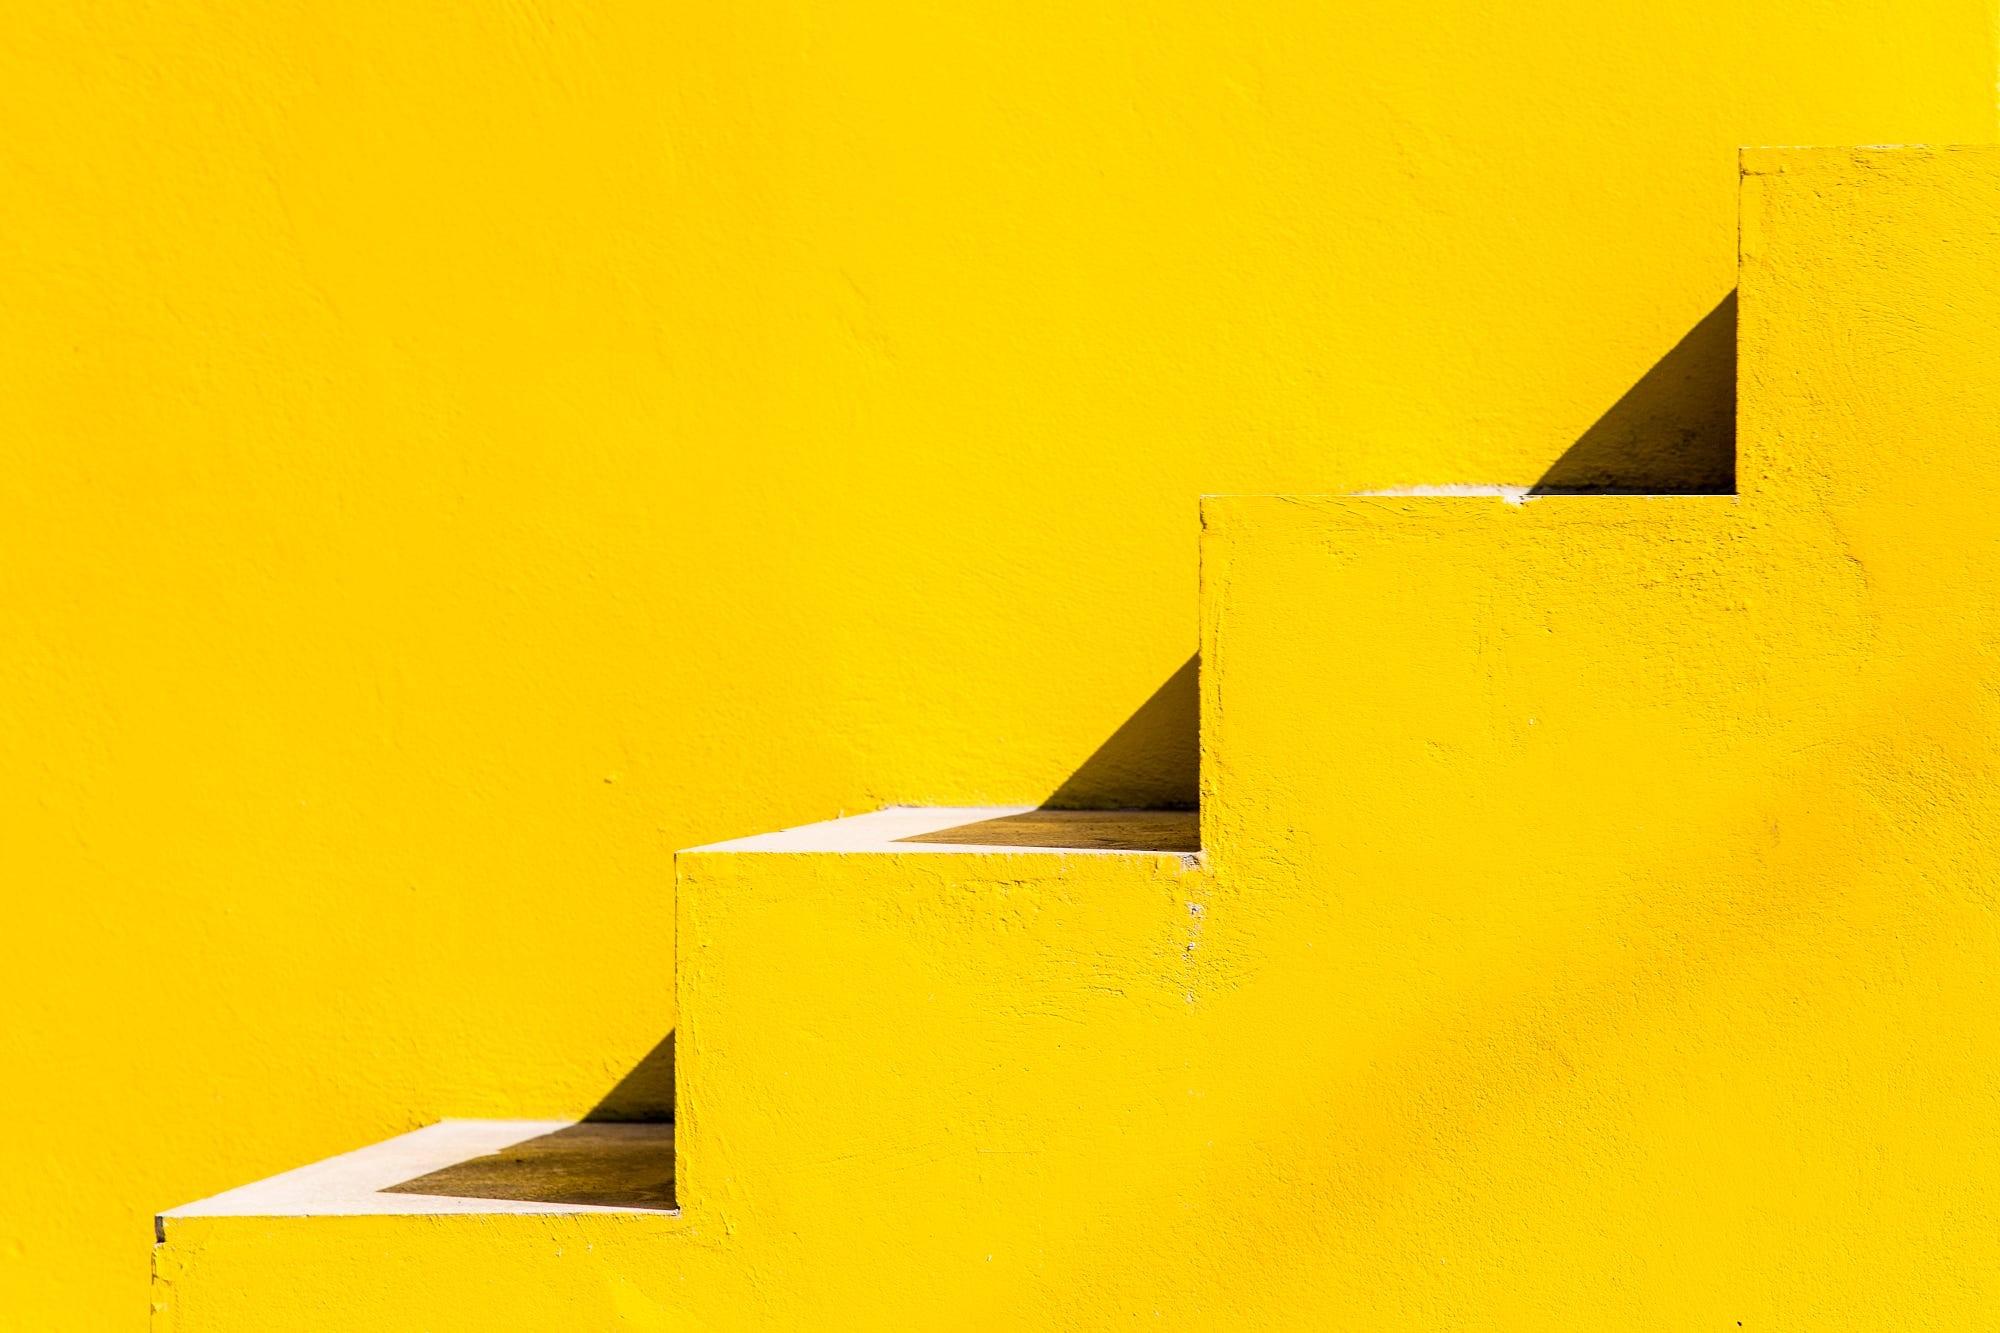 General 2000x1333 angle texture geometry yellow minimalism Cuba Havana shadow stairs yellow background bright